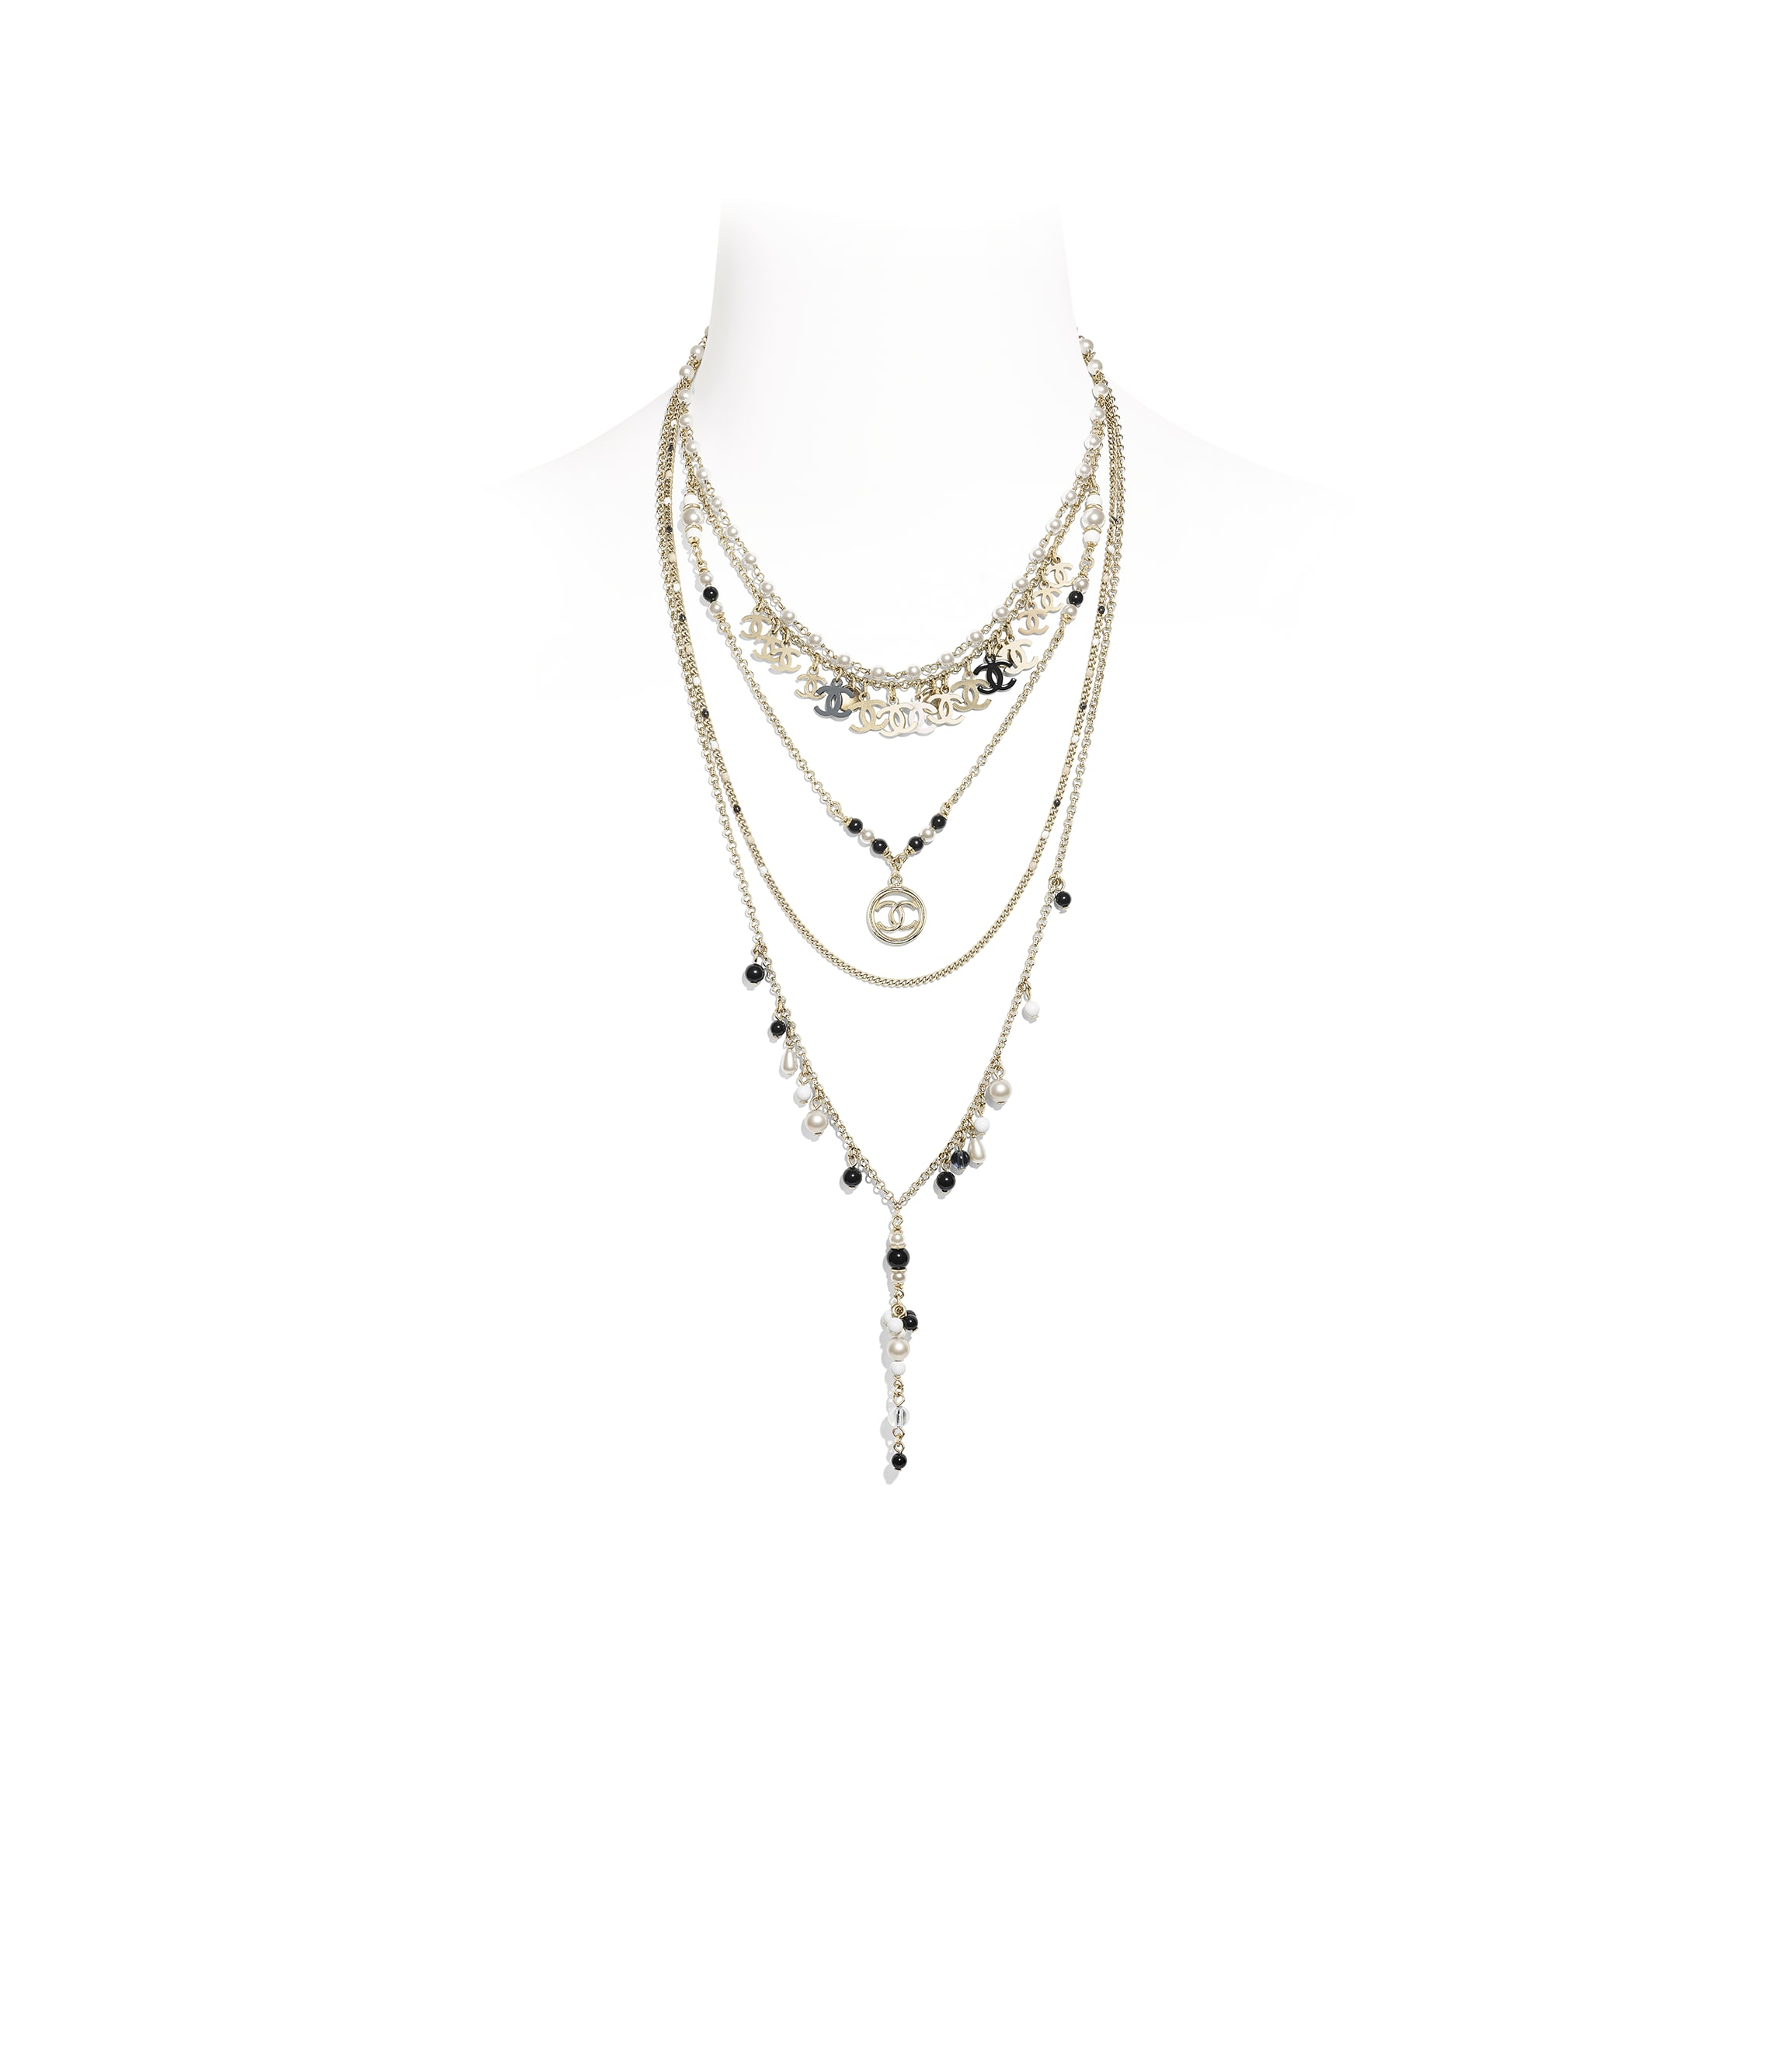 612fbb2a6d61f Costume Jewelry - CHANEL